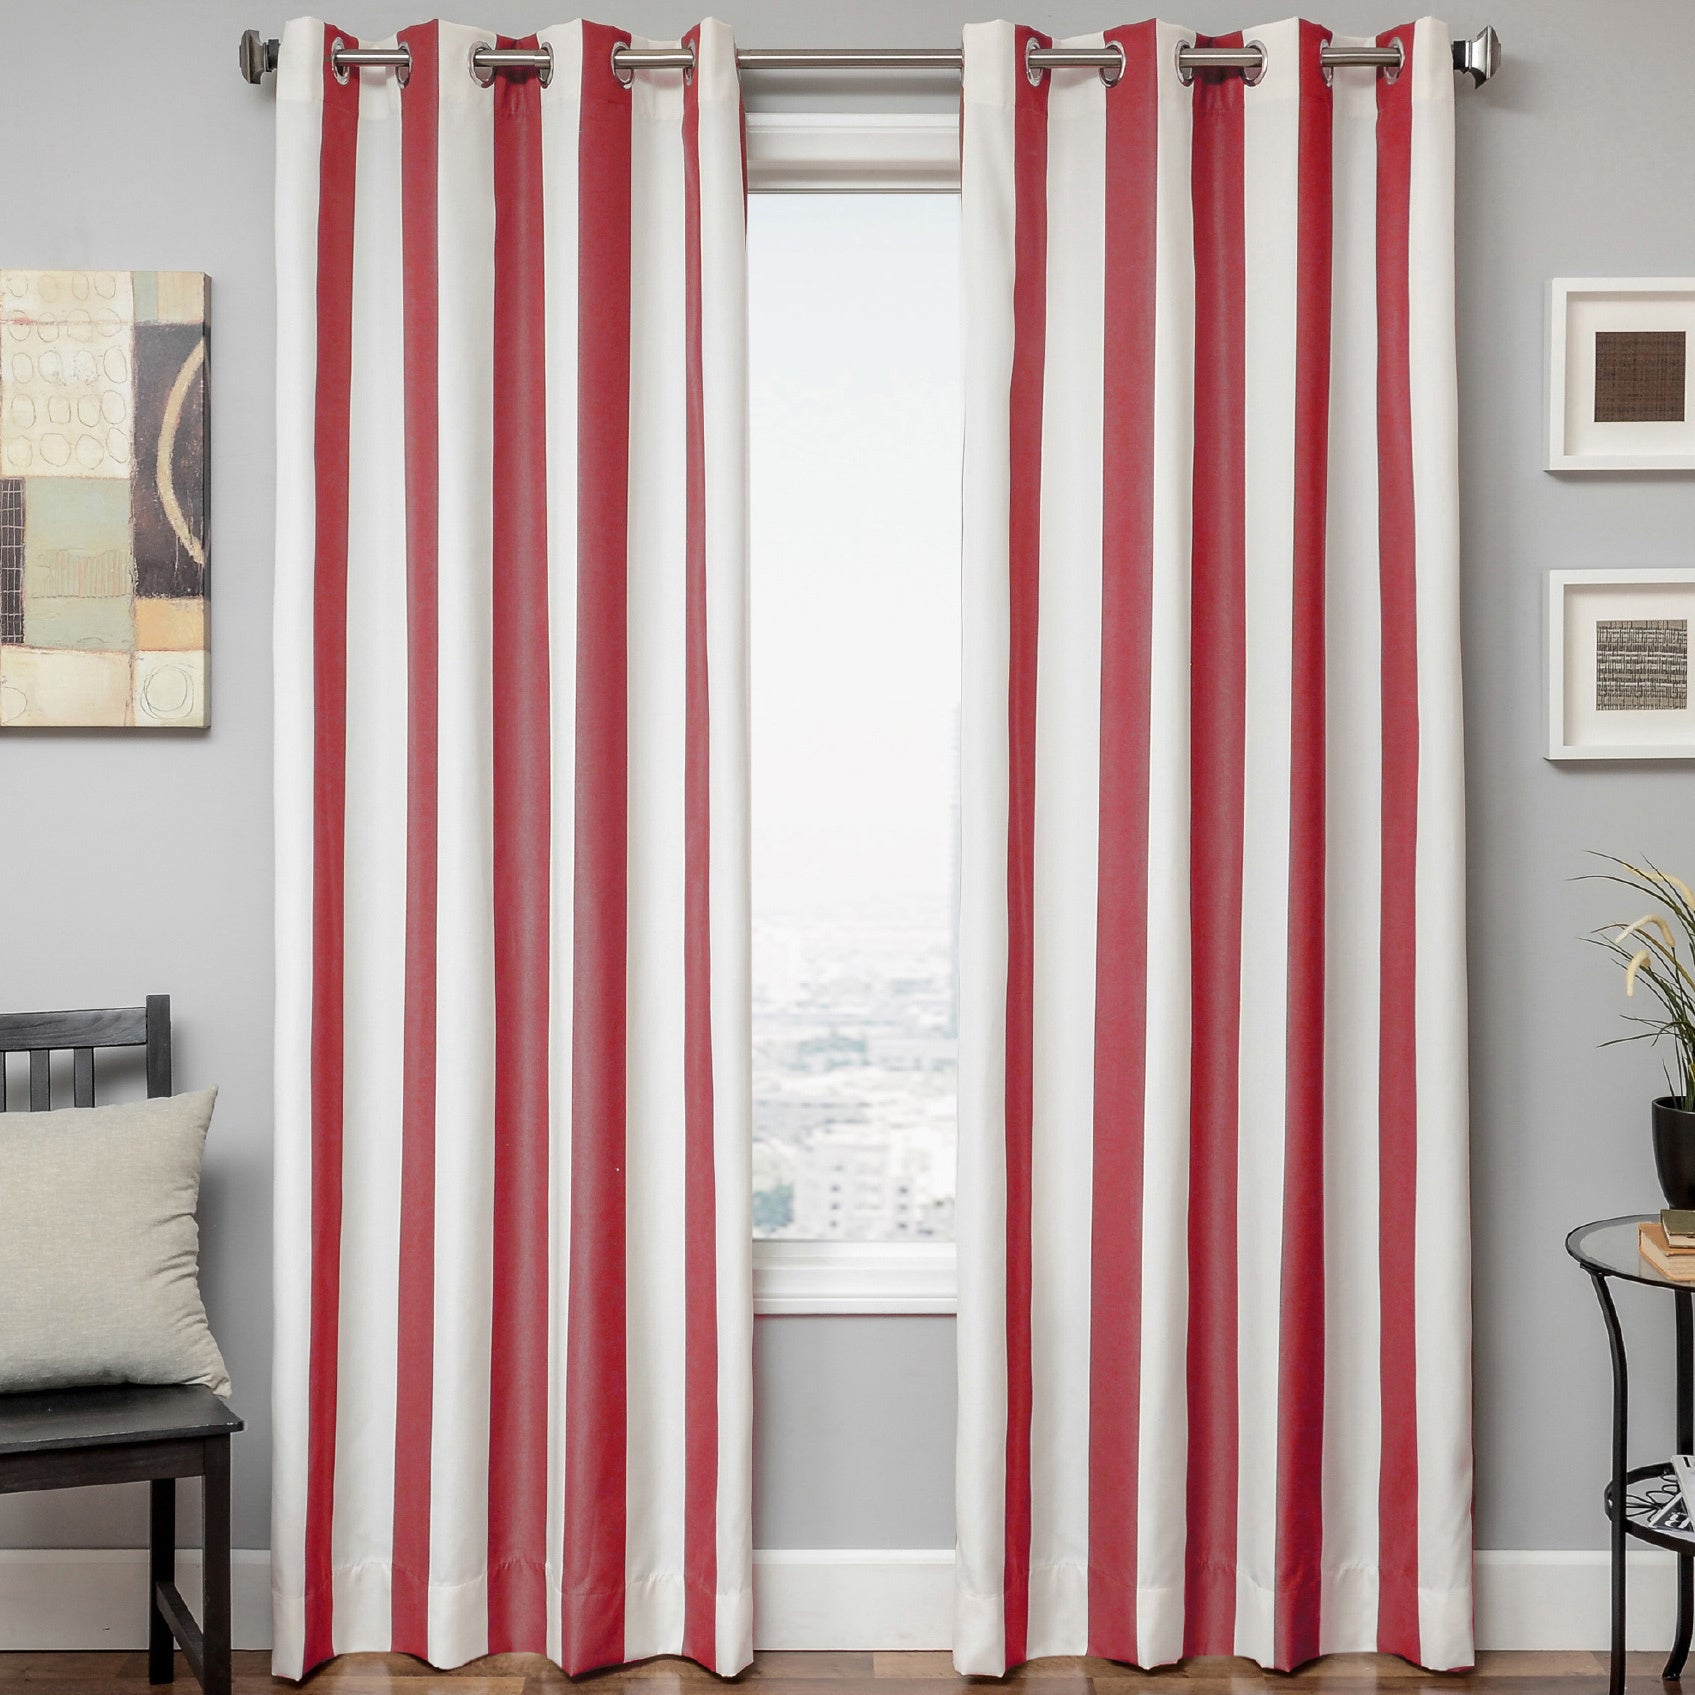 Softline Sunbrella Cabana Stripe Indoor/outdoor Curtain Panel For Valencia Cabana Stripe Indoor/outdoor Curtain Panels (View 21 of 30)